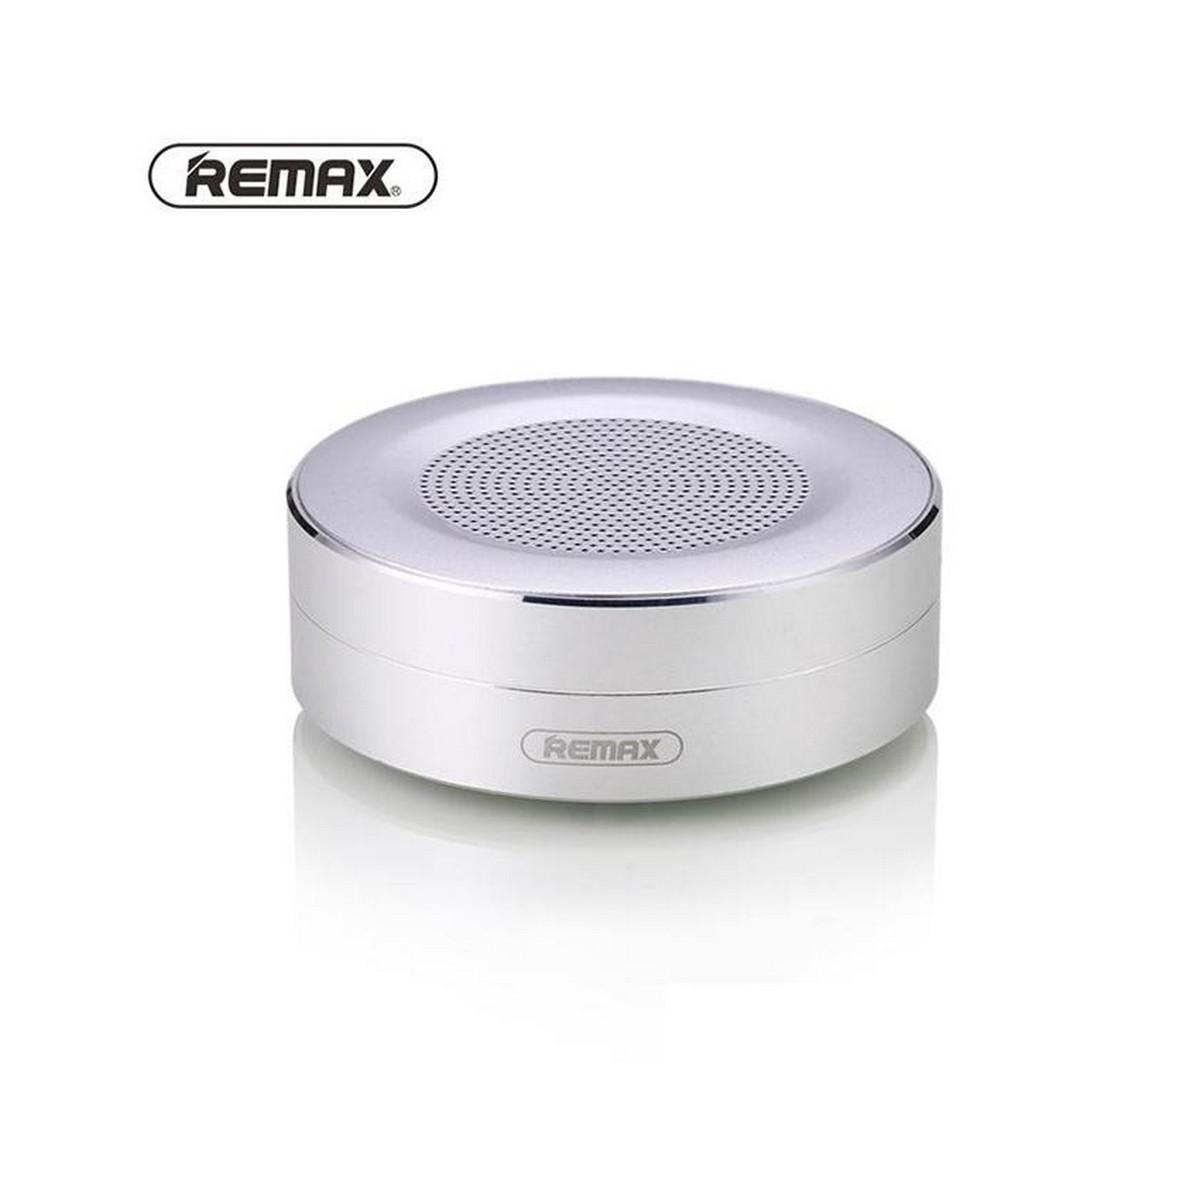 RB-M13 - Bluetooth Speaker - Silver